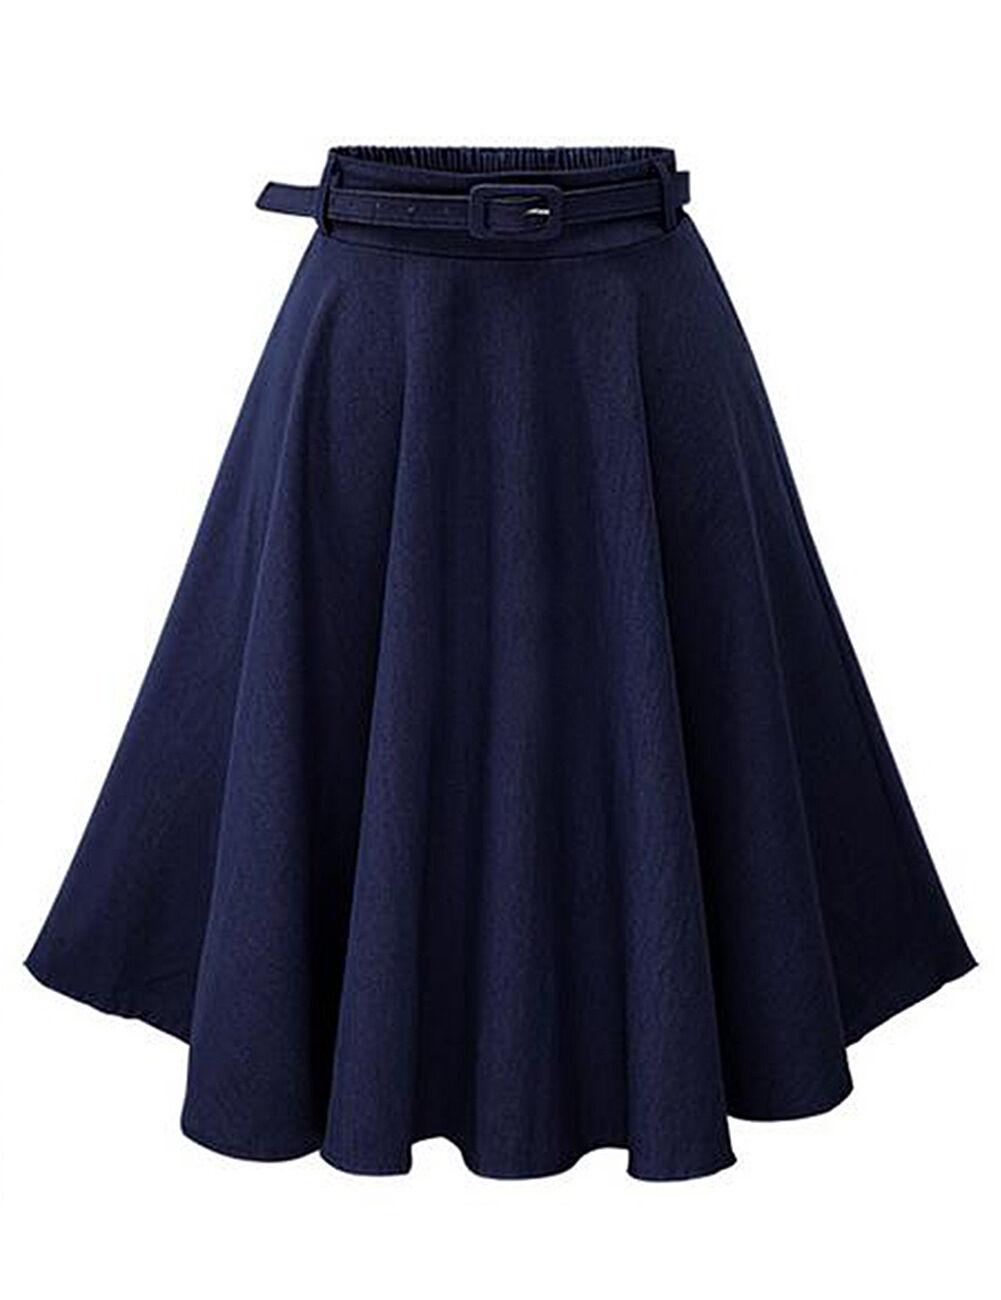 2016 Fashion Vintage Women High Waist Denim Jeans A-Line ...